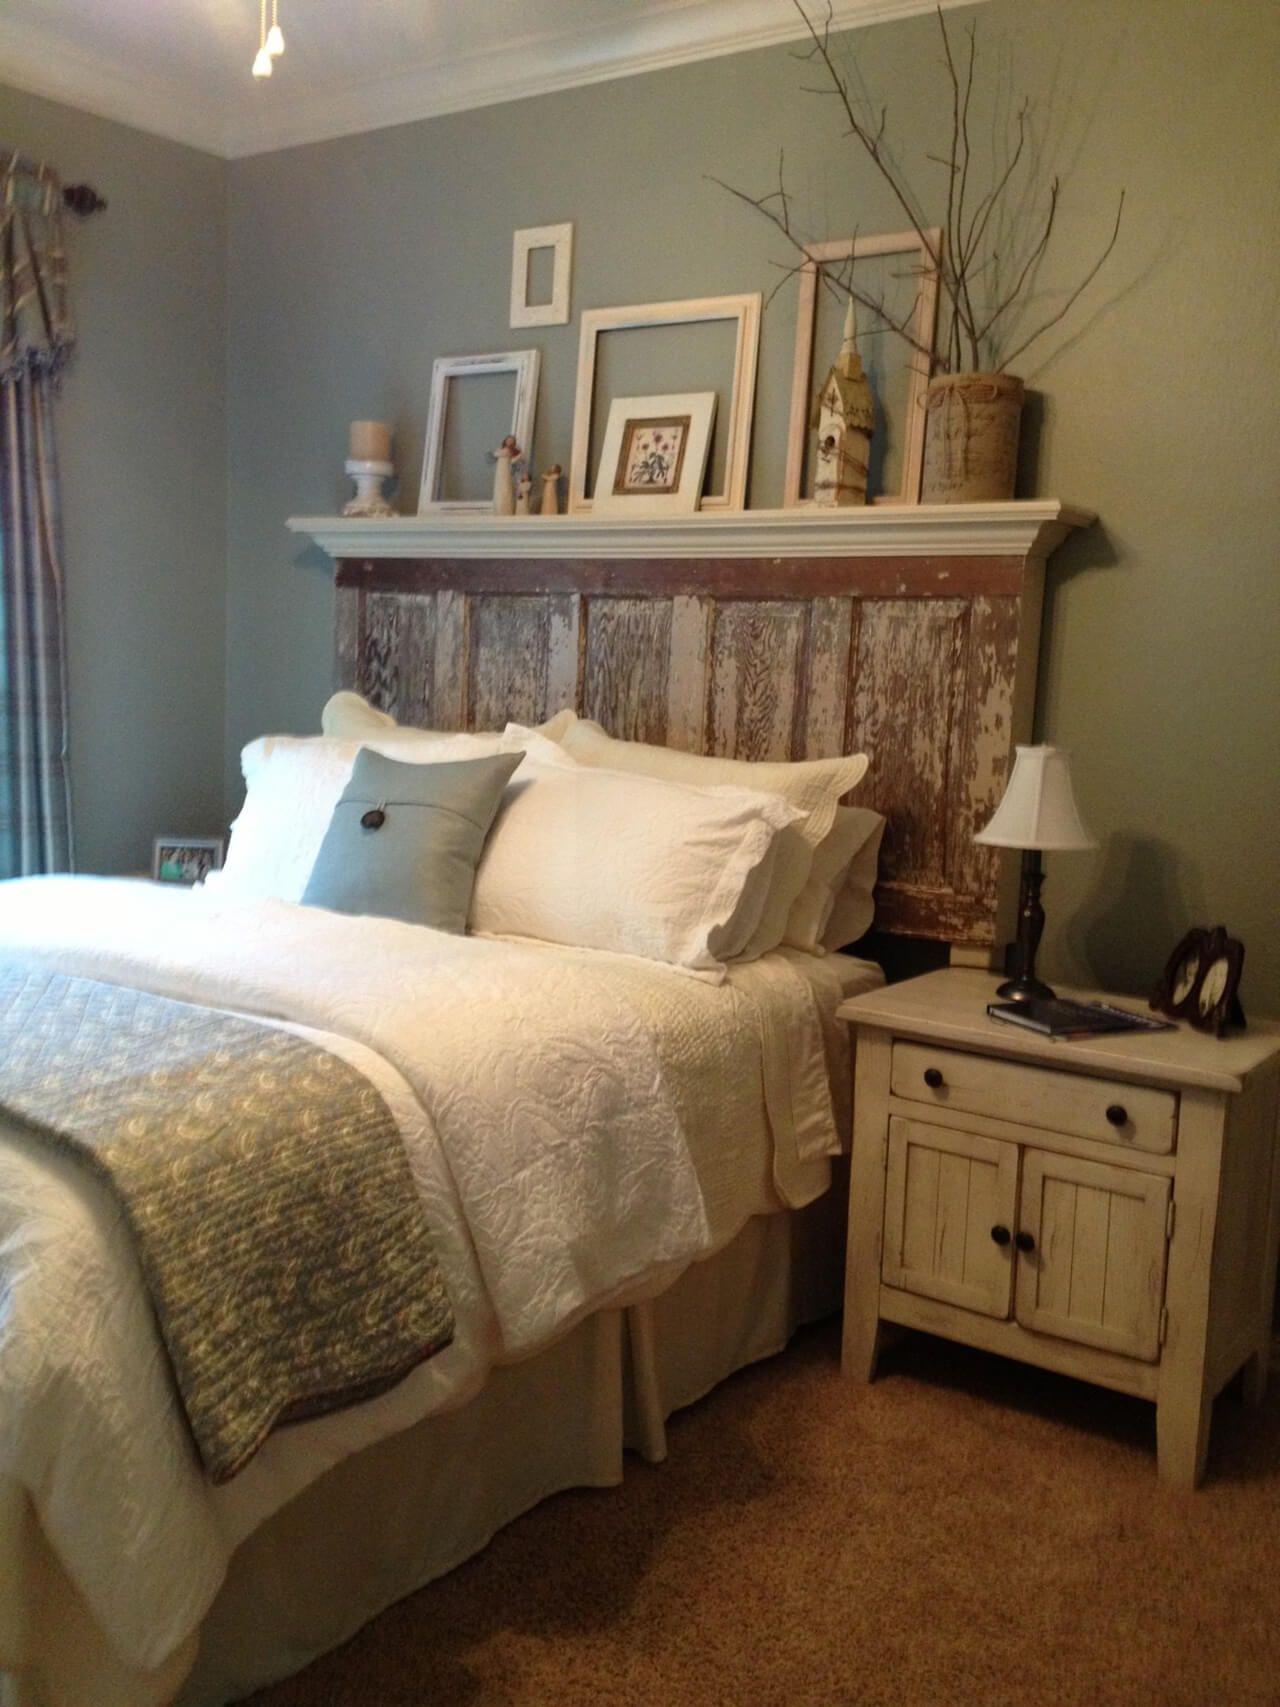 Master bedroom headboard   Artistic and Practical Repurposed Old Door Ideas  Bed headboards